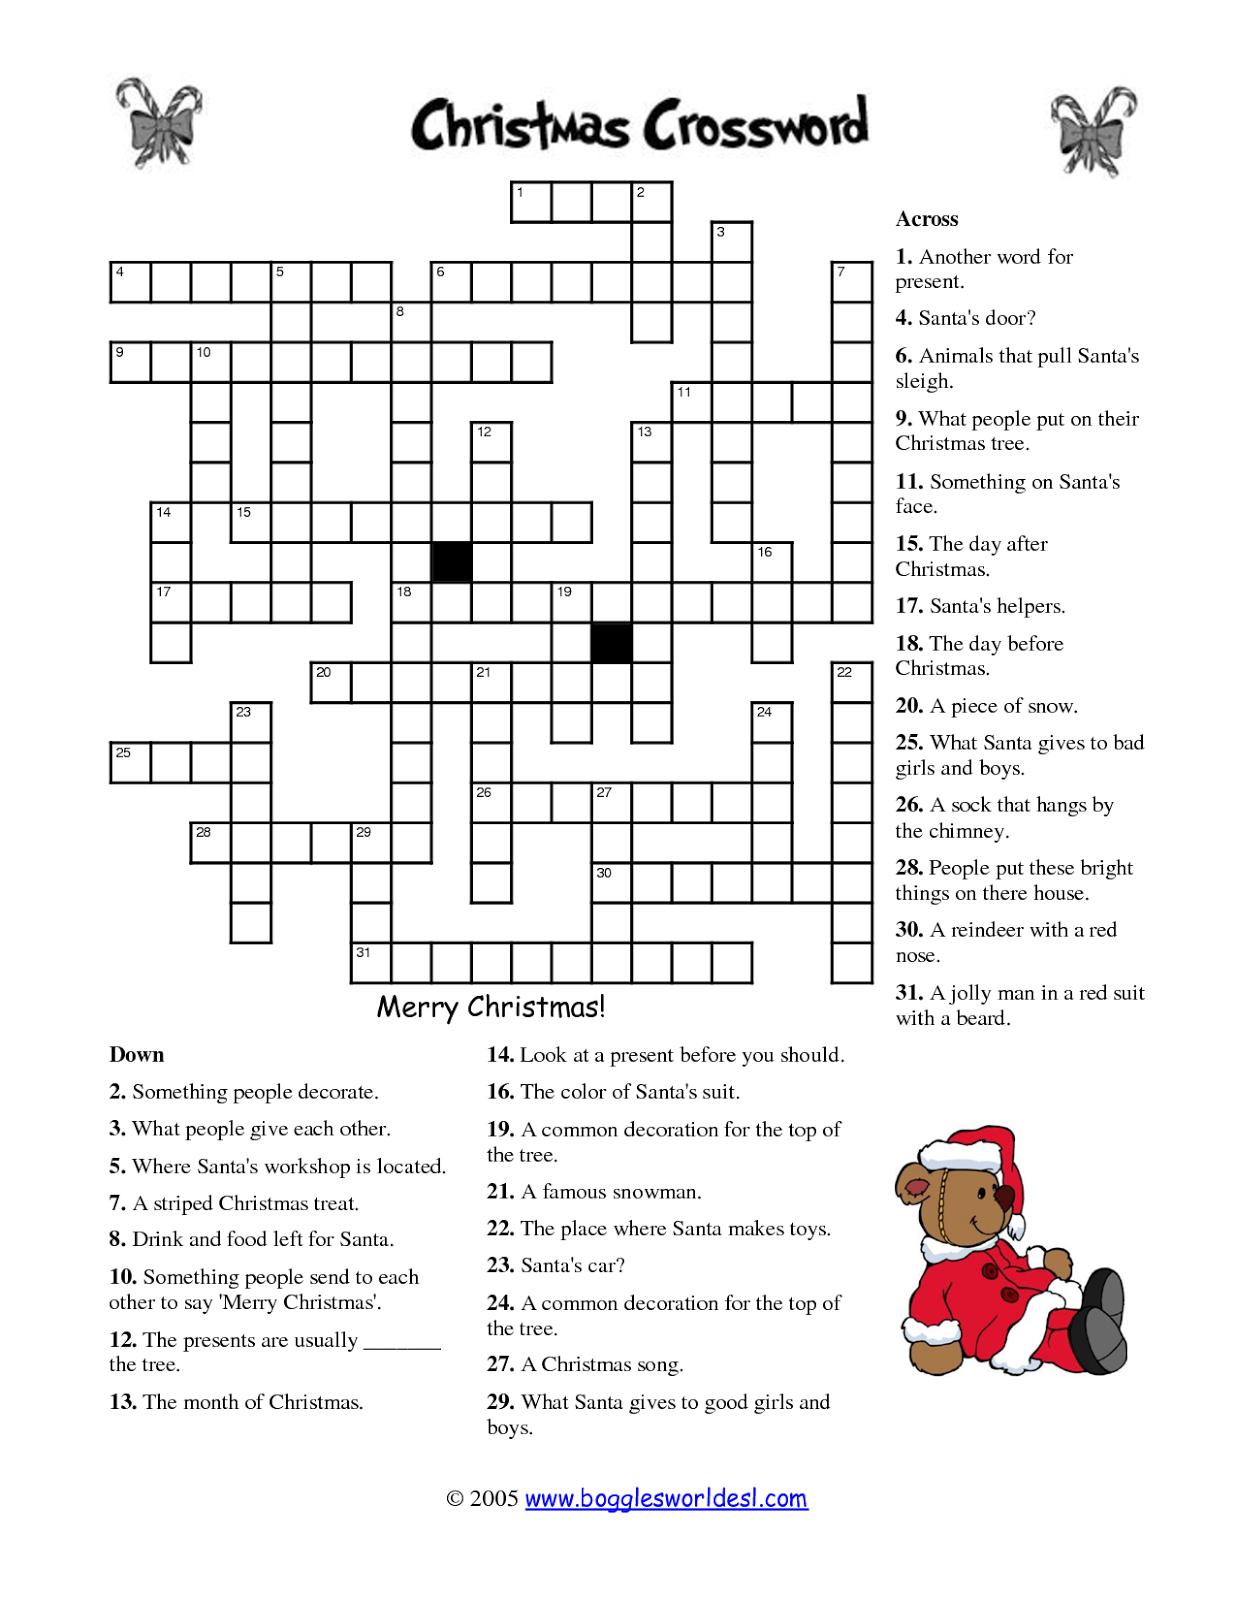 Free Printable Cards: Free Printable Crossword Puzzles | Christmas - Printable Crossword Puzzles About Cars